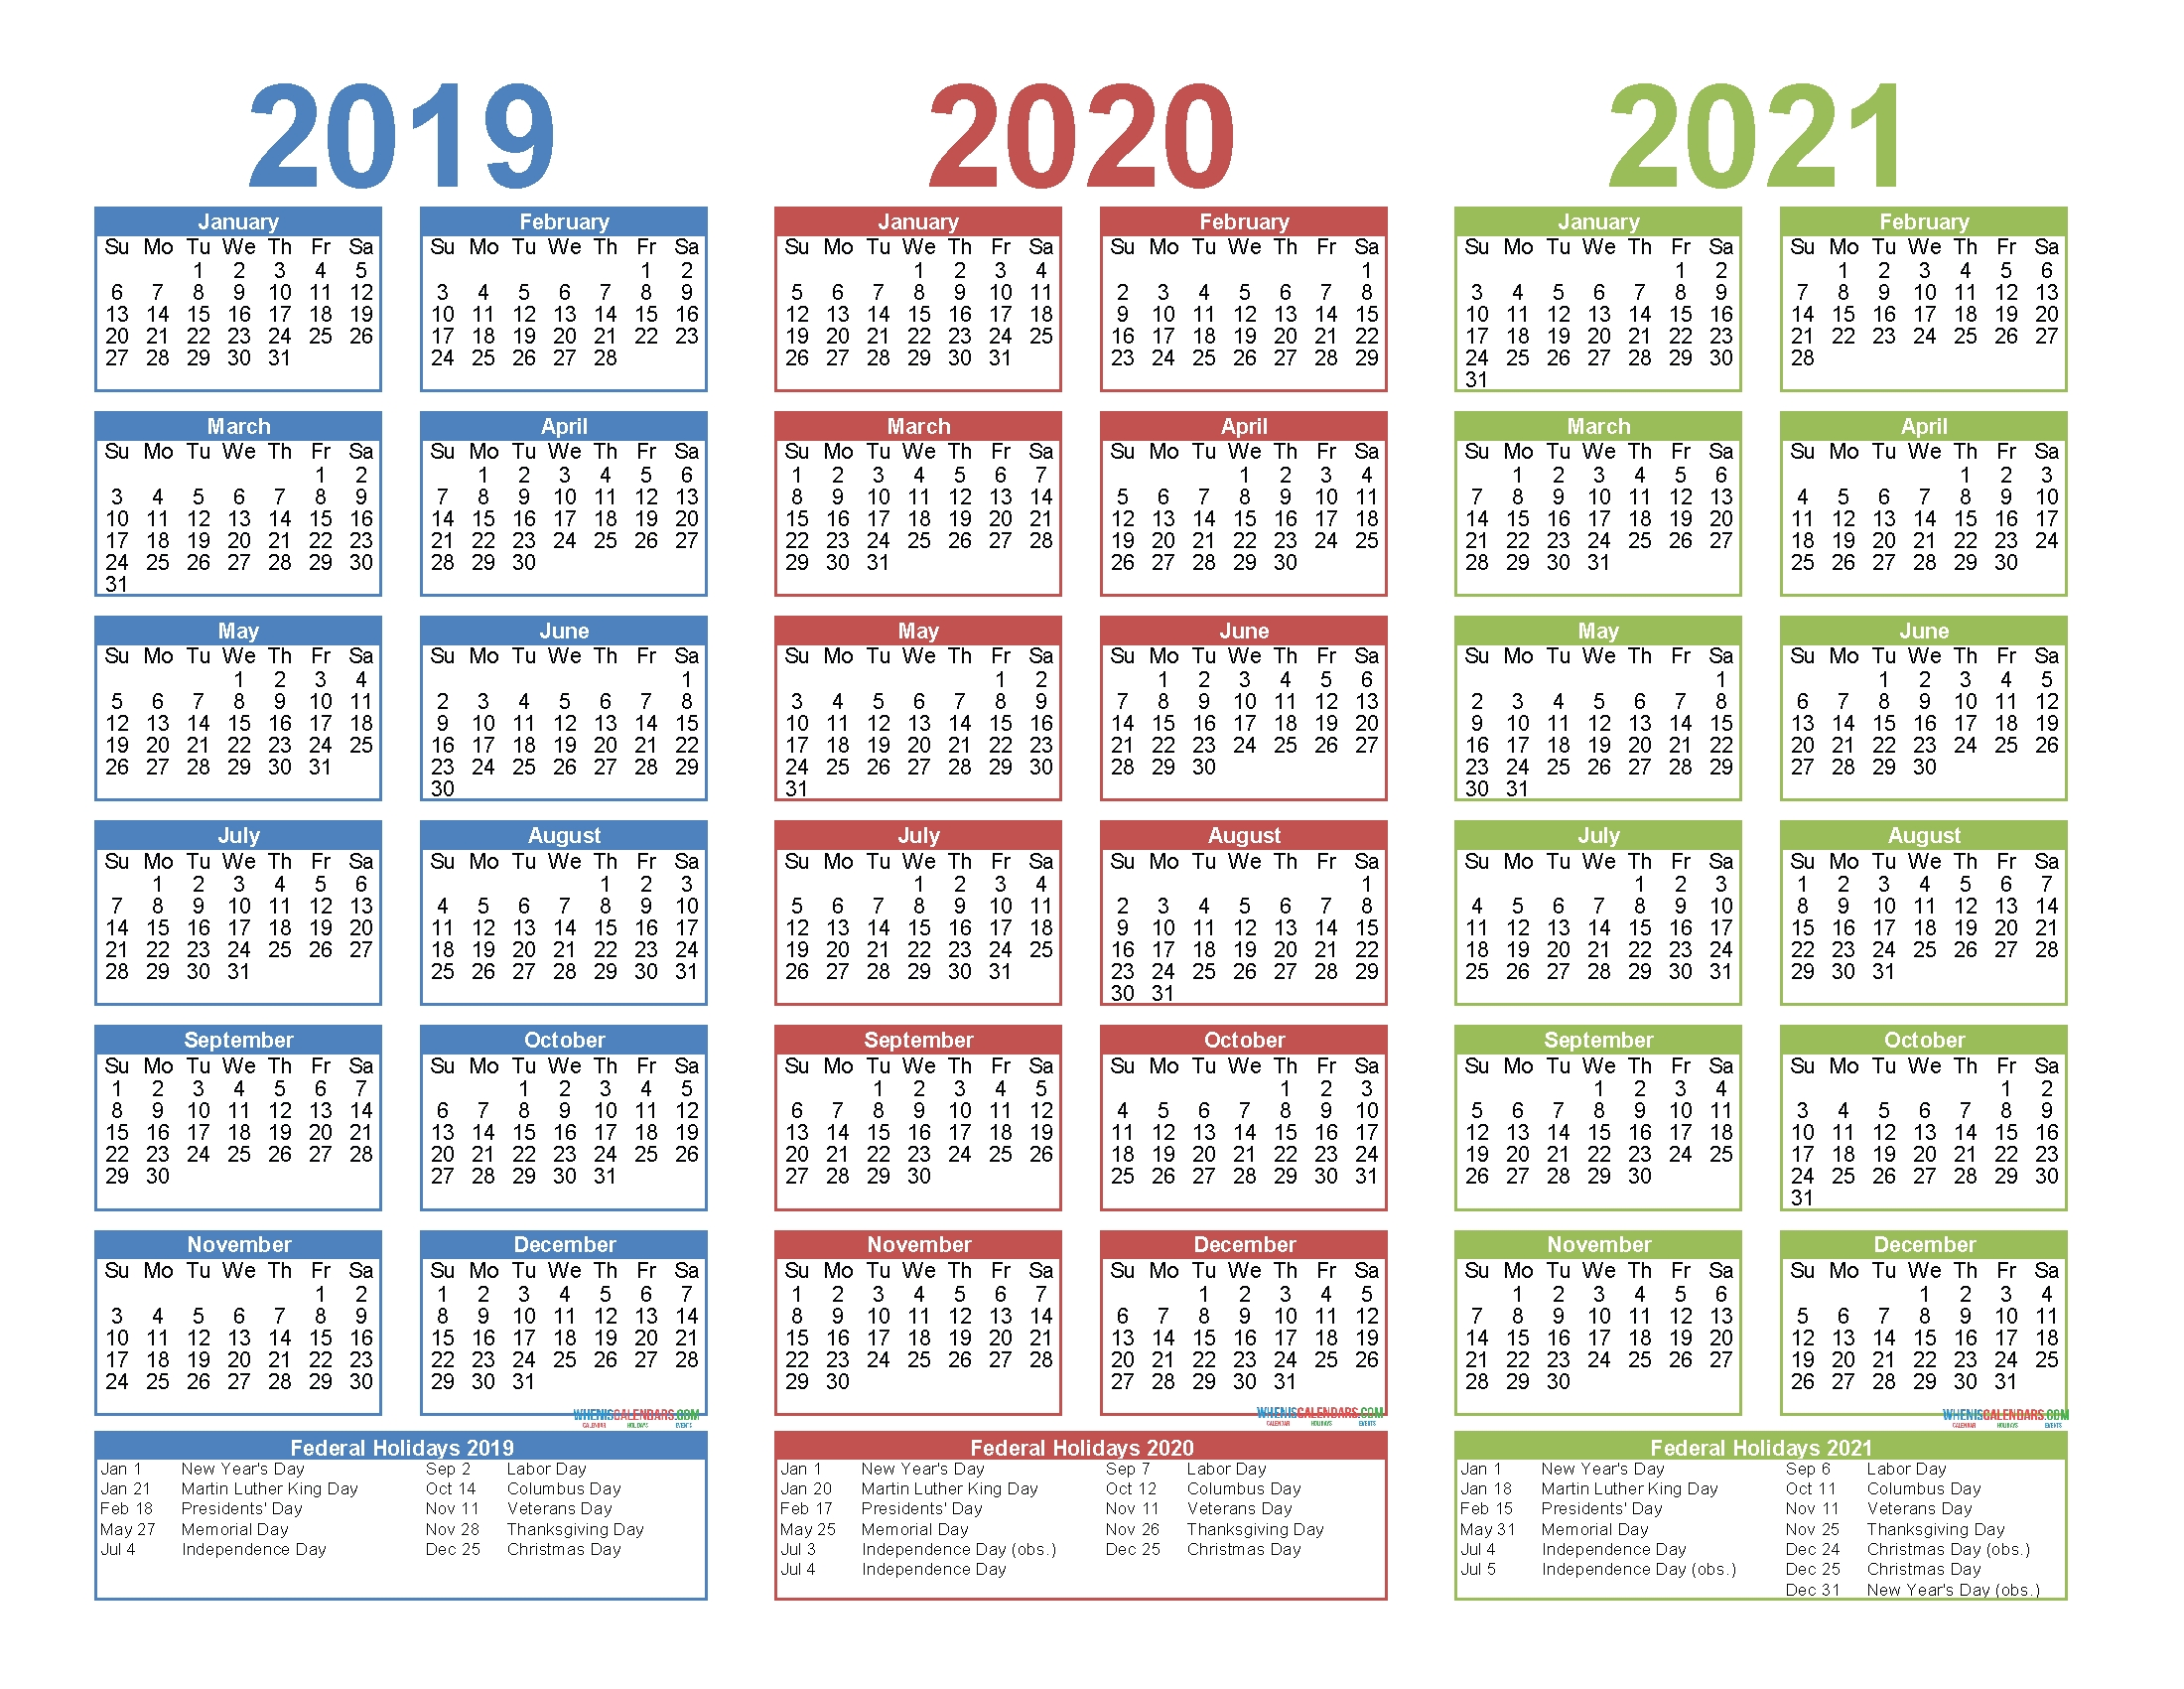 3 Year Calendar Printable 2019 2020 2021 Free Calendar with regard to 3 Year Calendar 2019 2020 2021 Printable